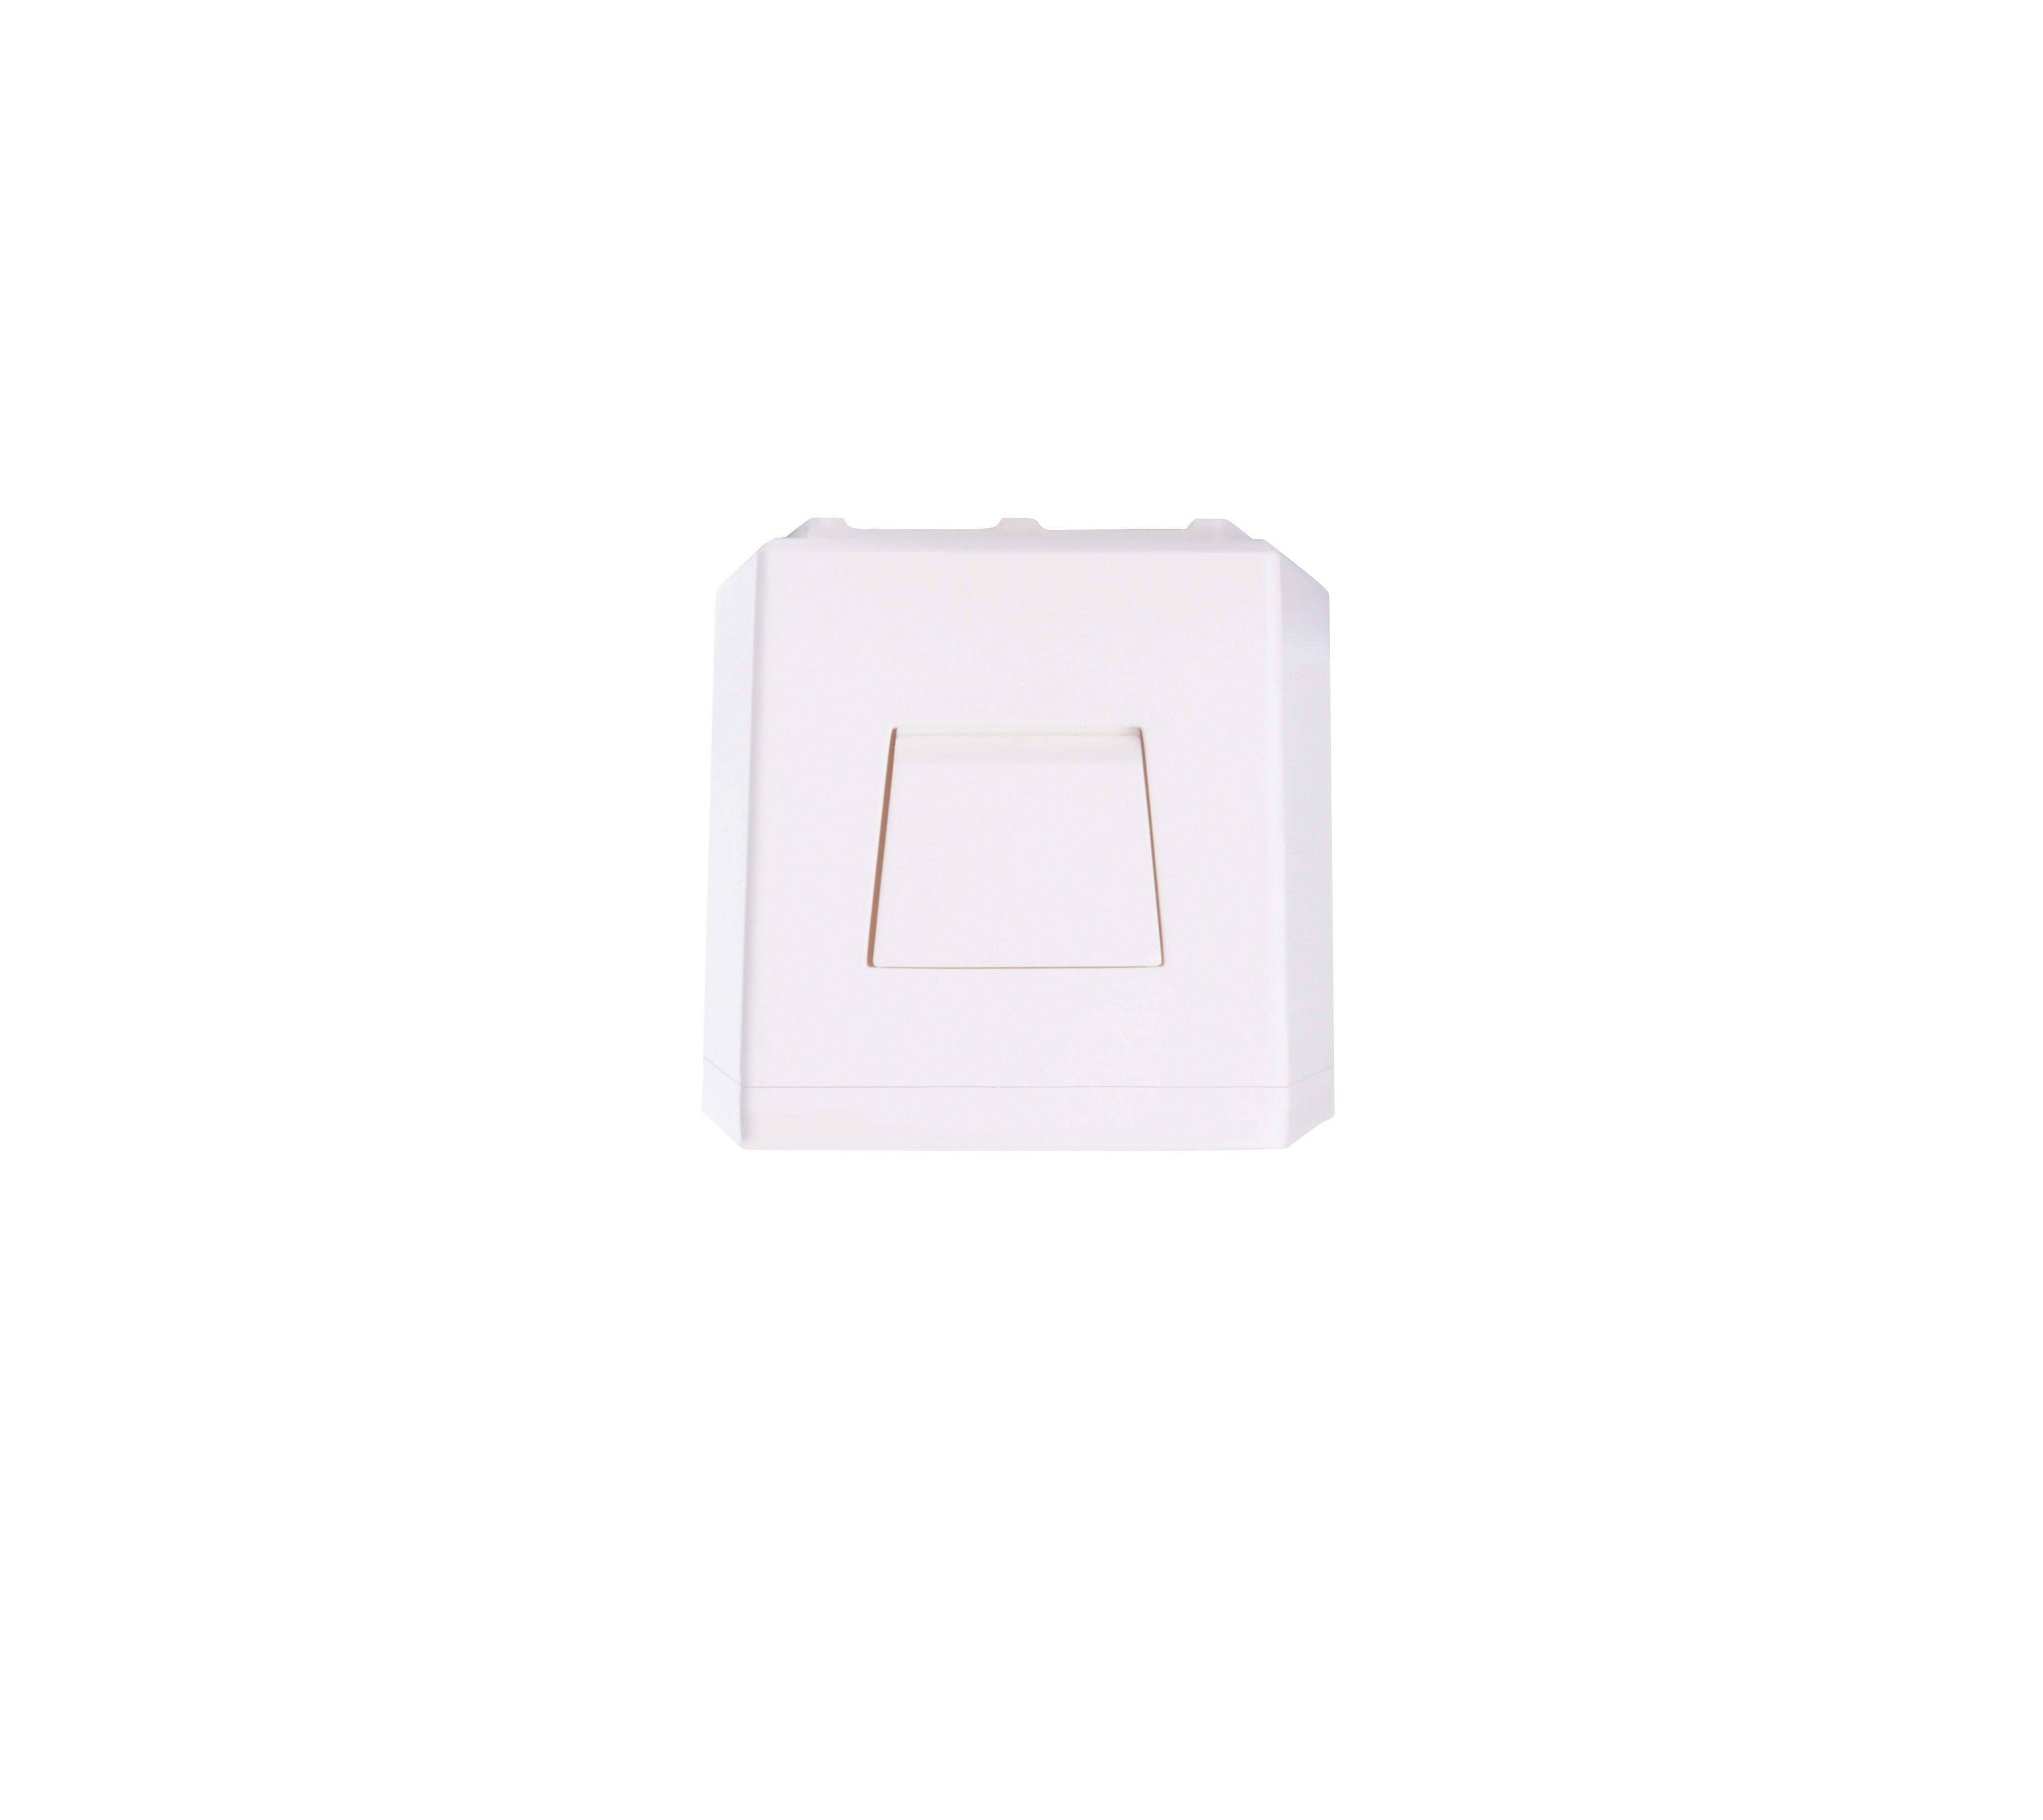 Lampa emergenta led Intelight 94525   2h nementinut test automat 1